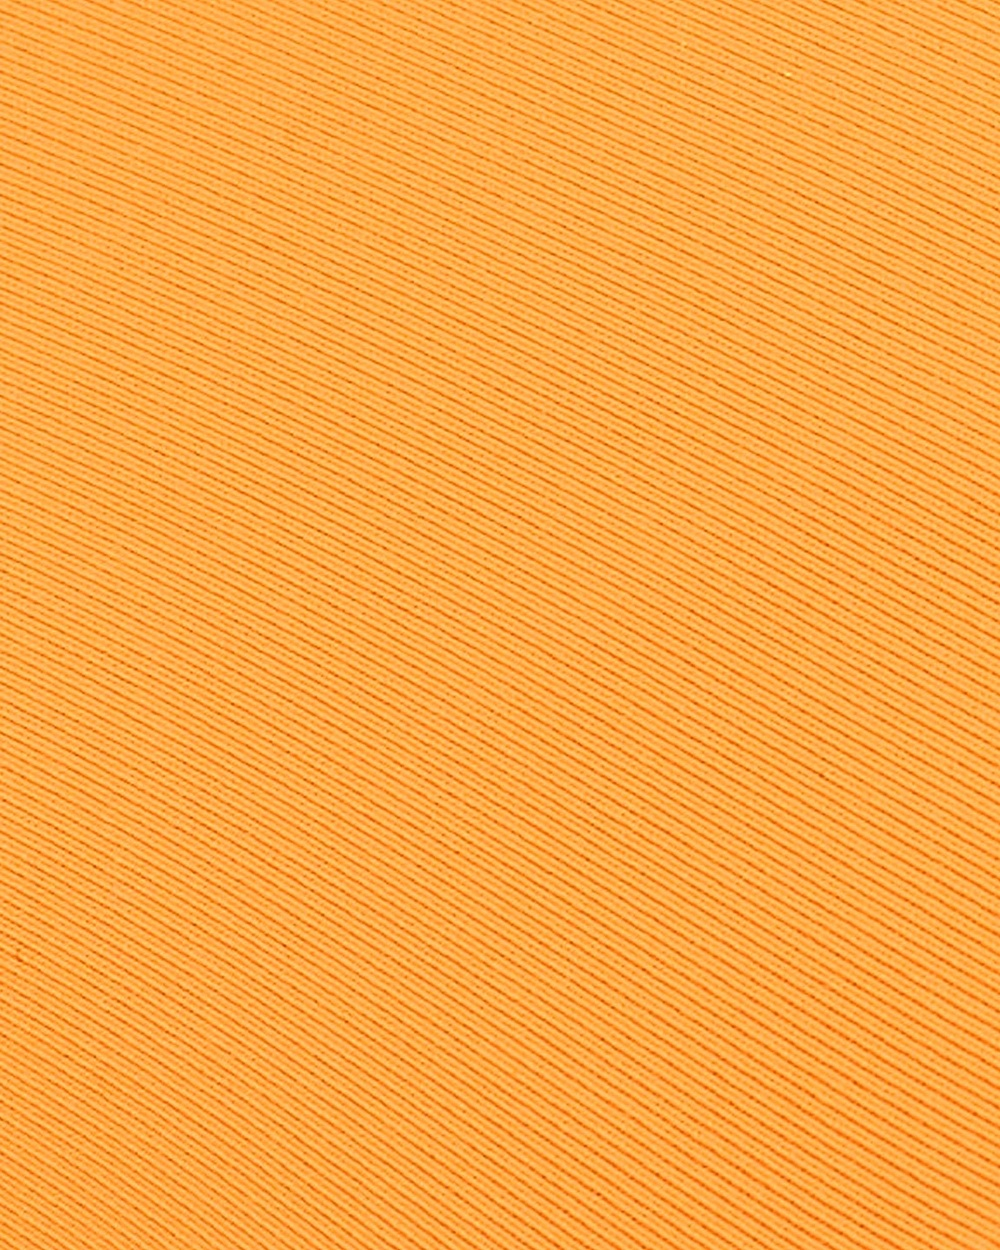 Bond-Eye Swimwear Suns Out Briefs Bikini Bottoms Yellow Suns Out Briefs